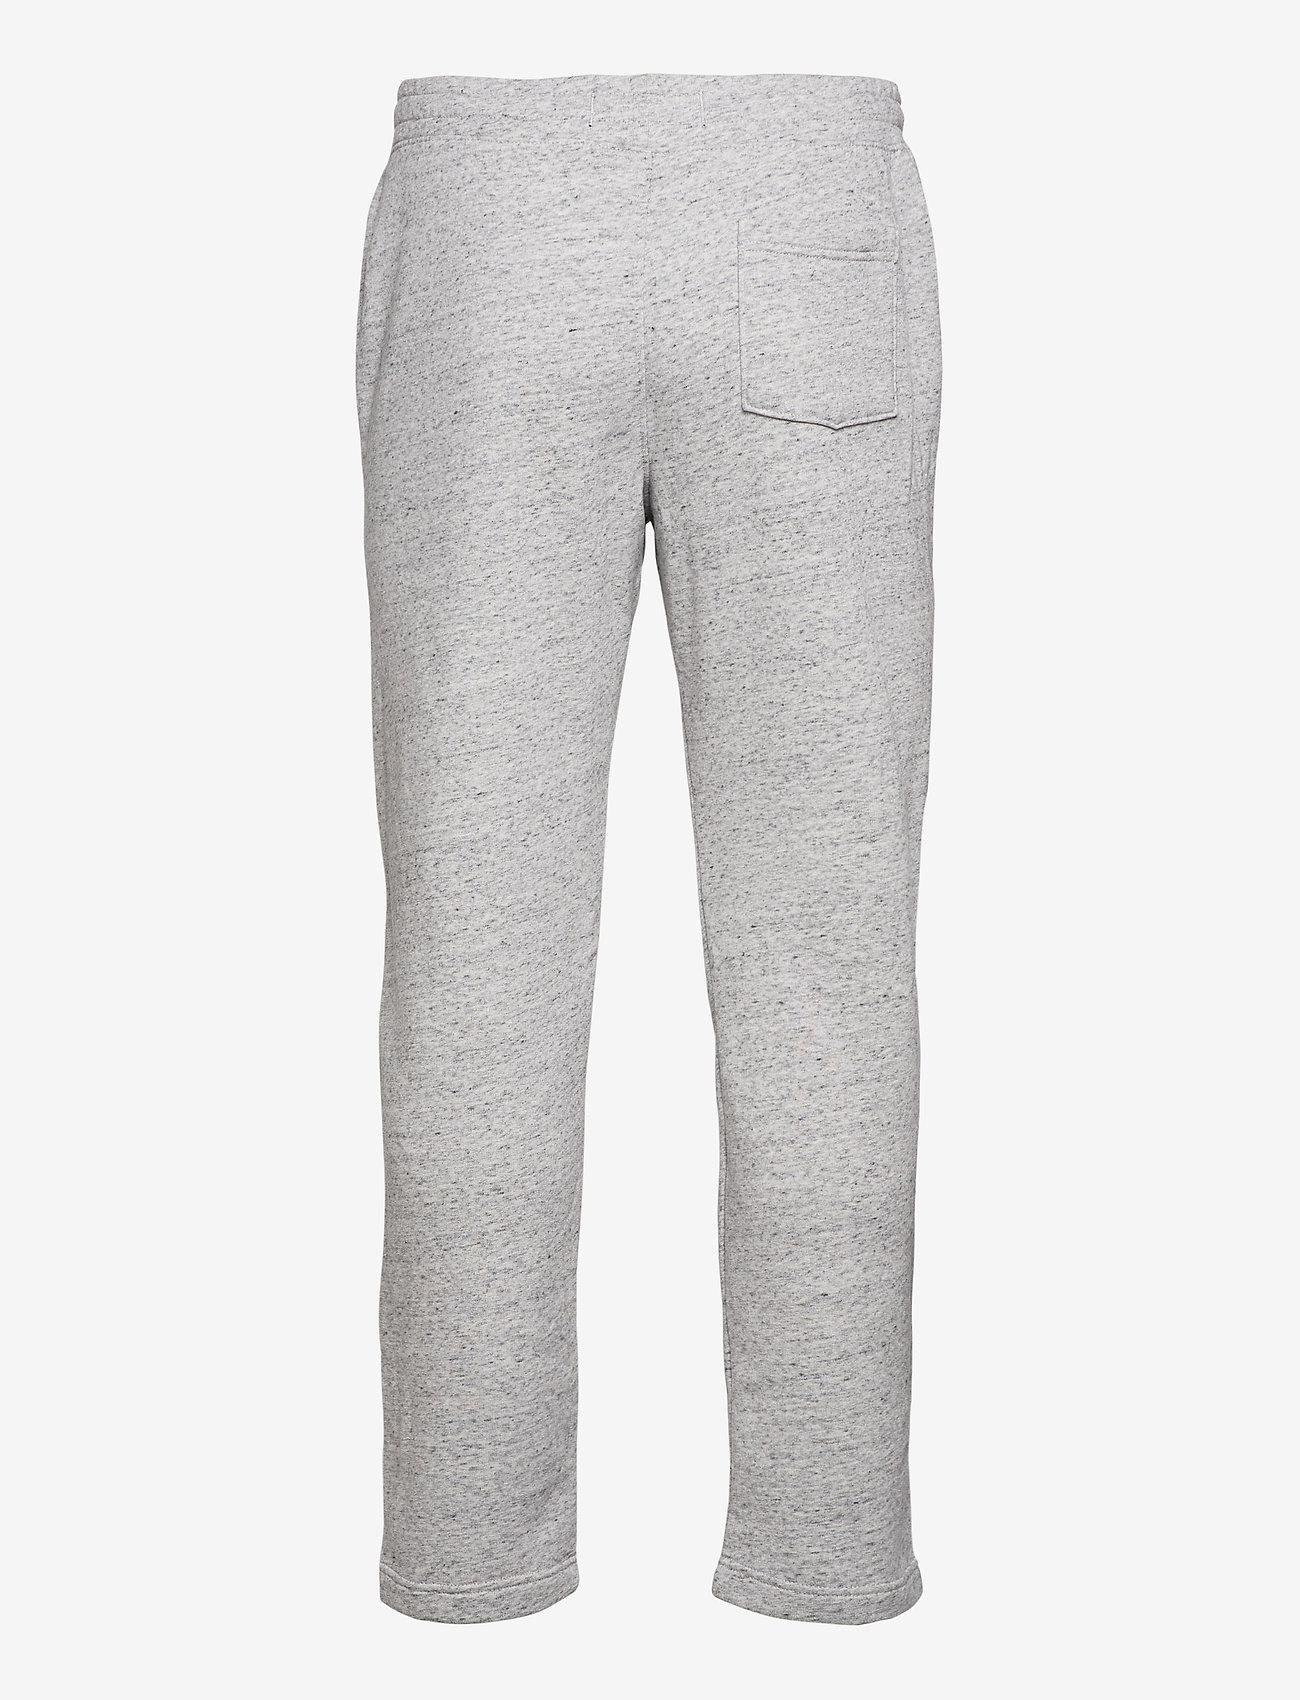 Hollister Straight Leg Sweatpants - Joggebukser LIGHT GREY SD/TEXTURE - Menn Klær